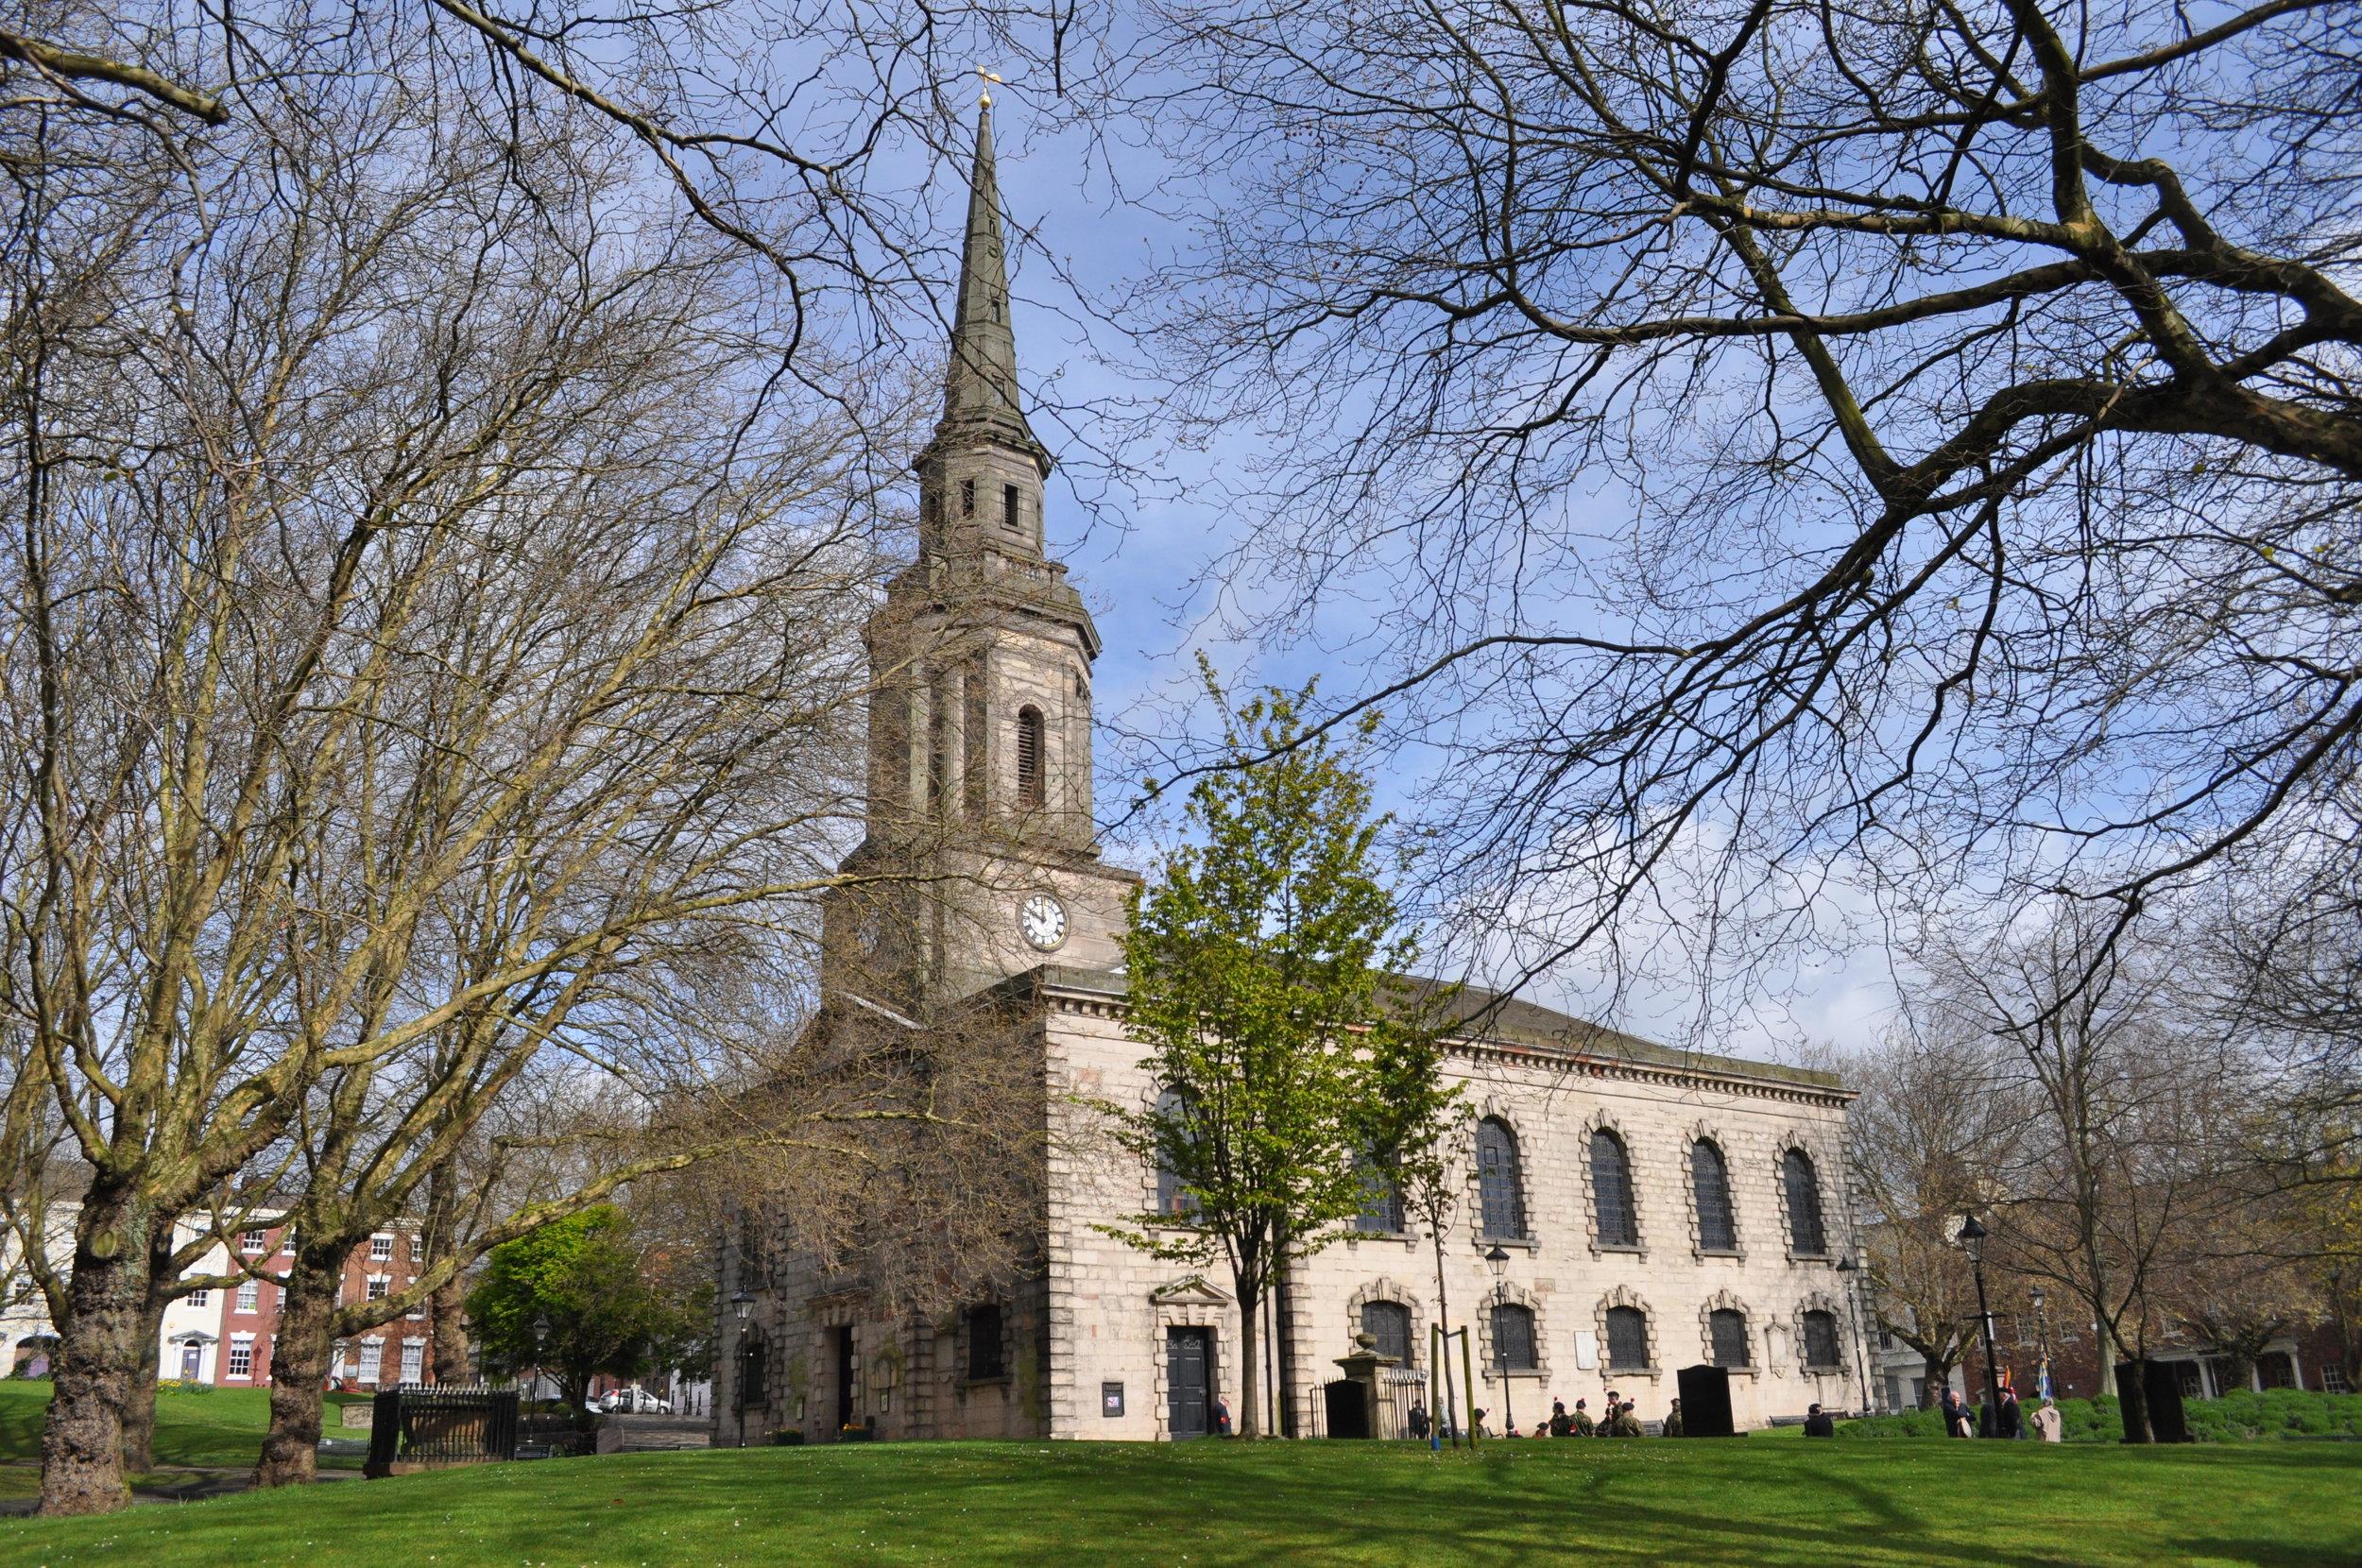 St Paul's Church. Photo by Robert Jones.